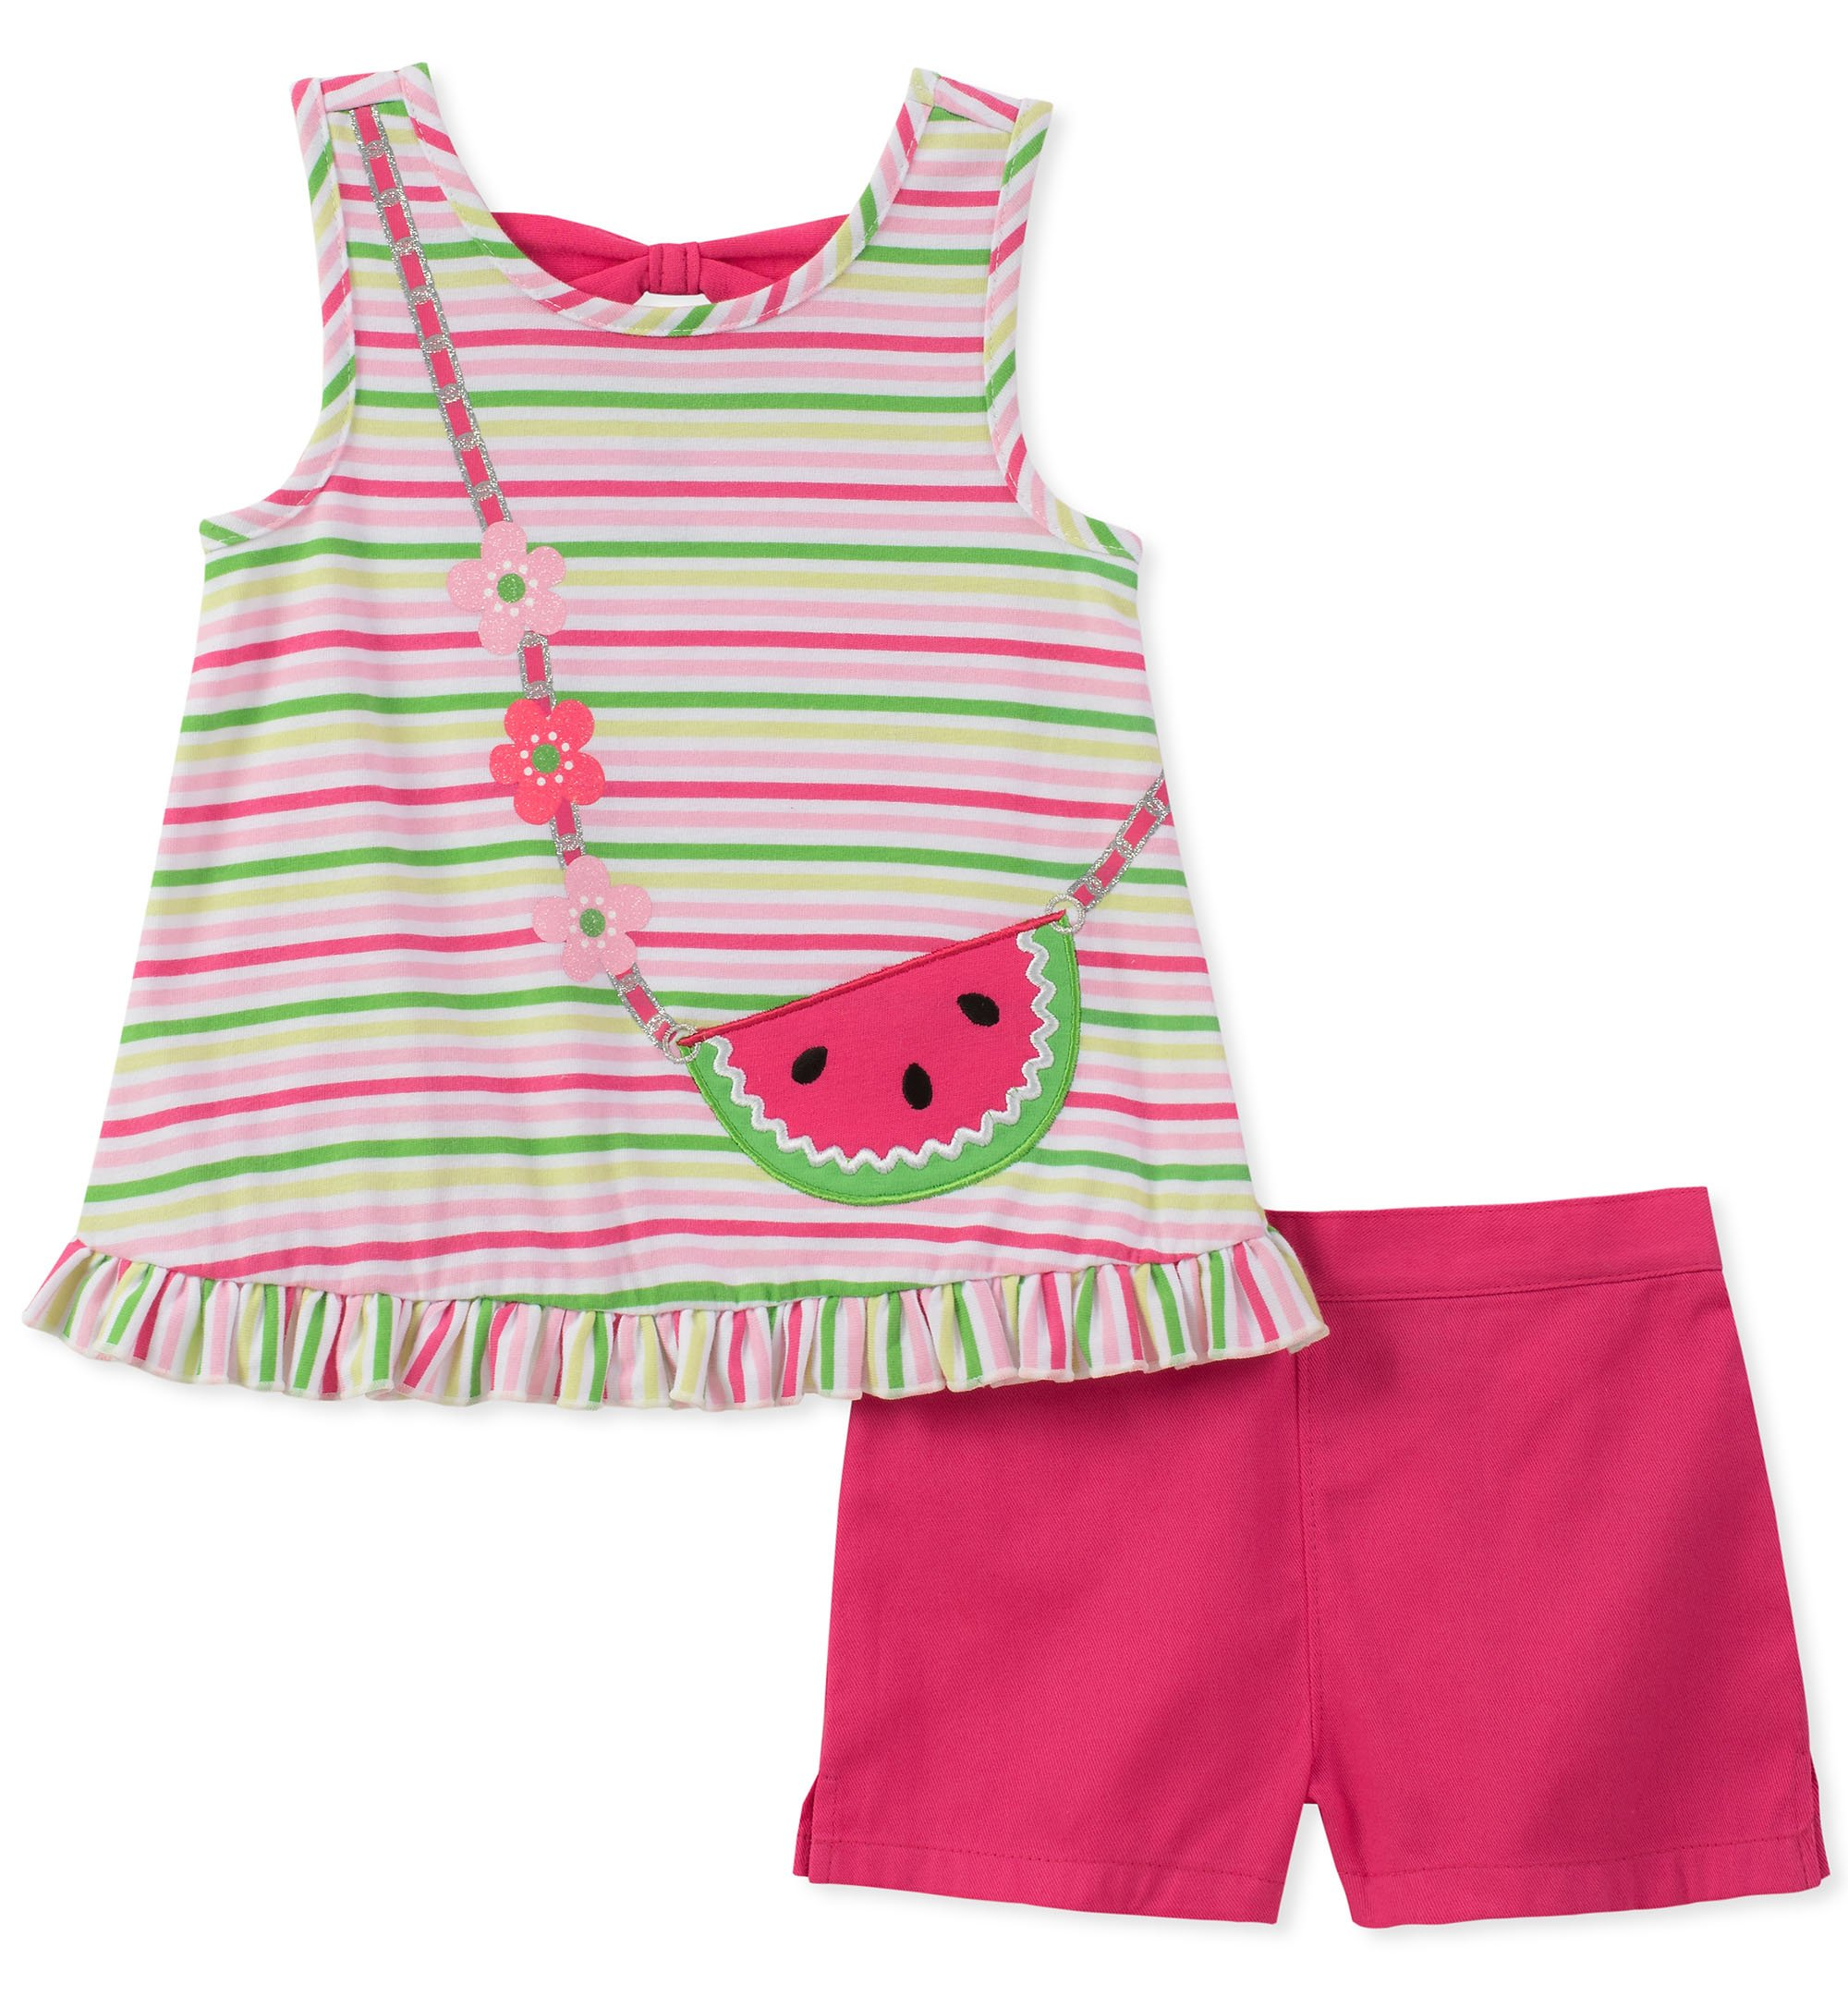 Kids Headquarters Little Girls' 2 Pieces Shorts Set, Watermelon, 6X